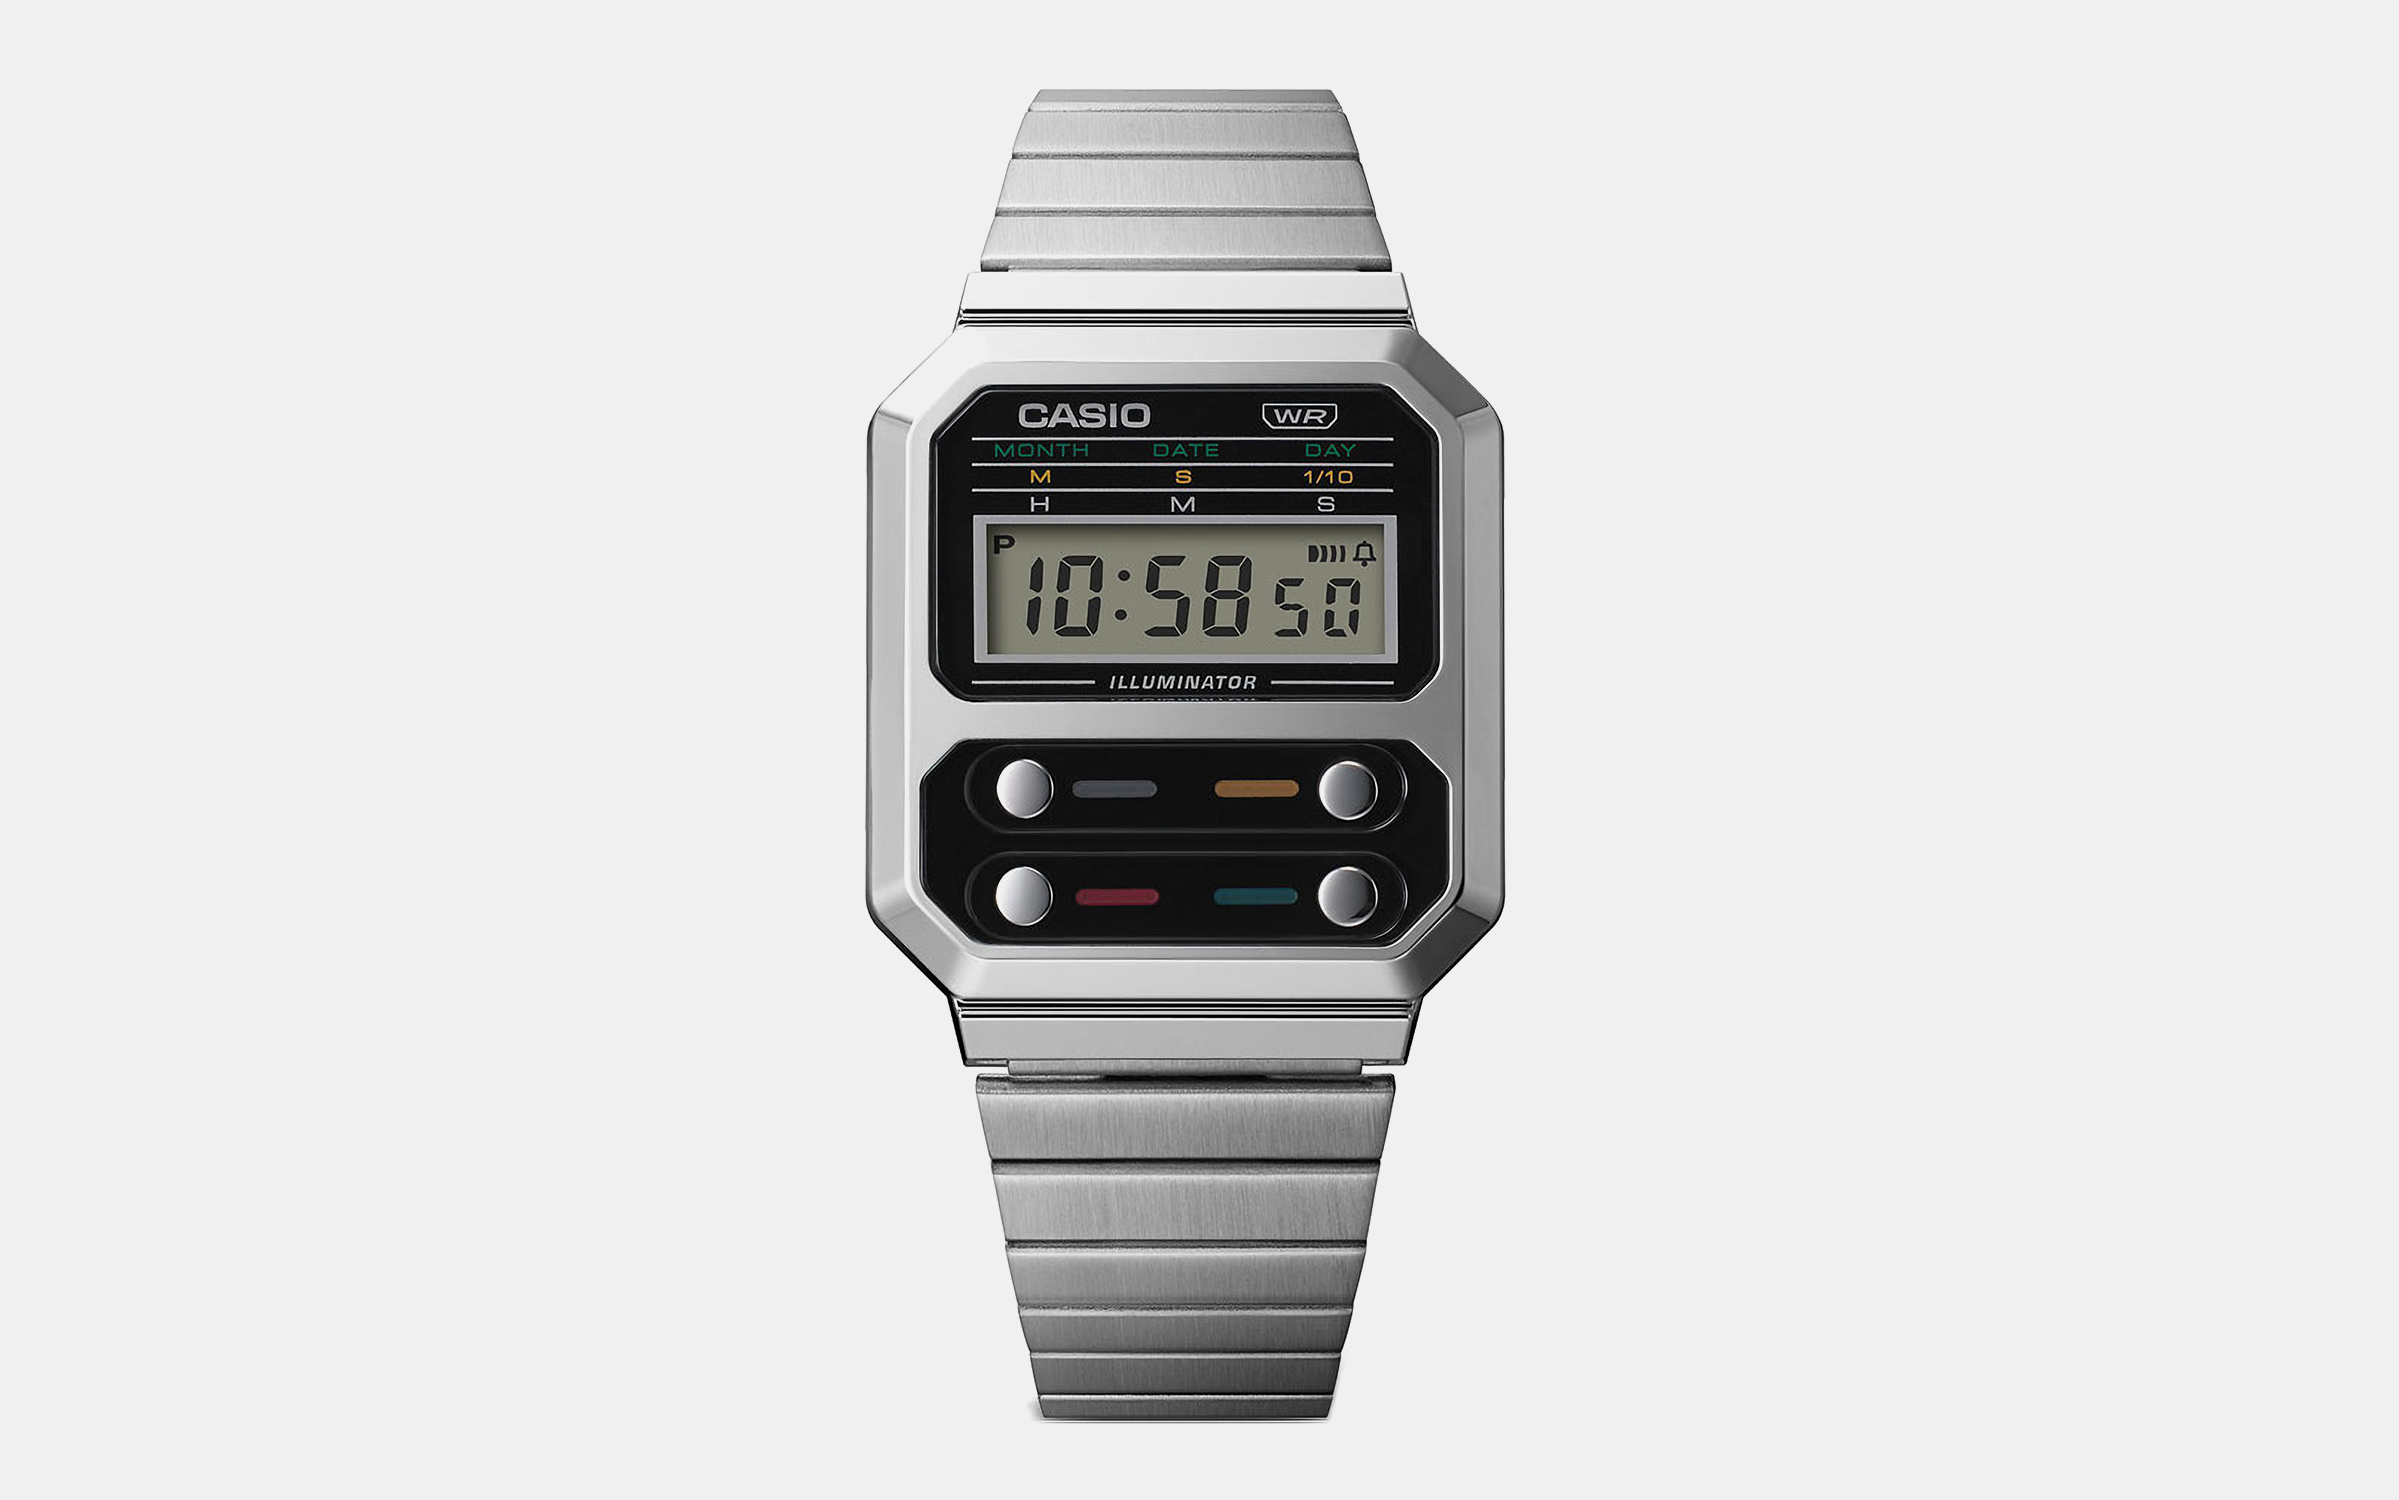 Casio Vintage A100 Series Watches